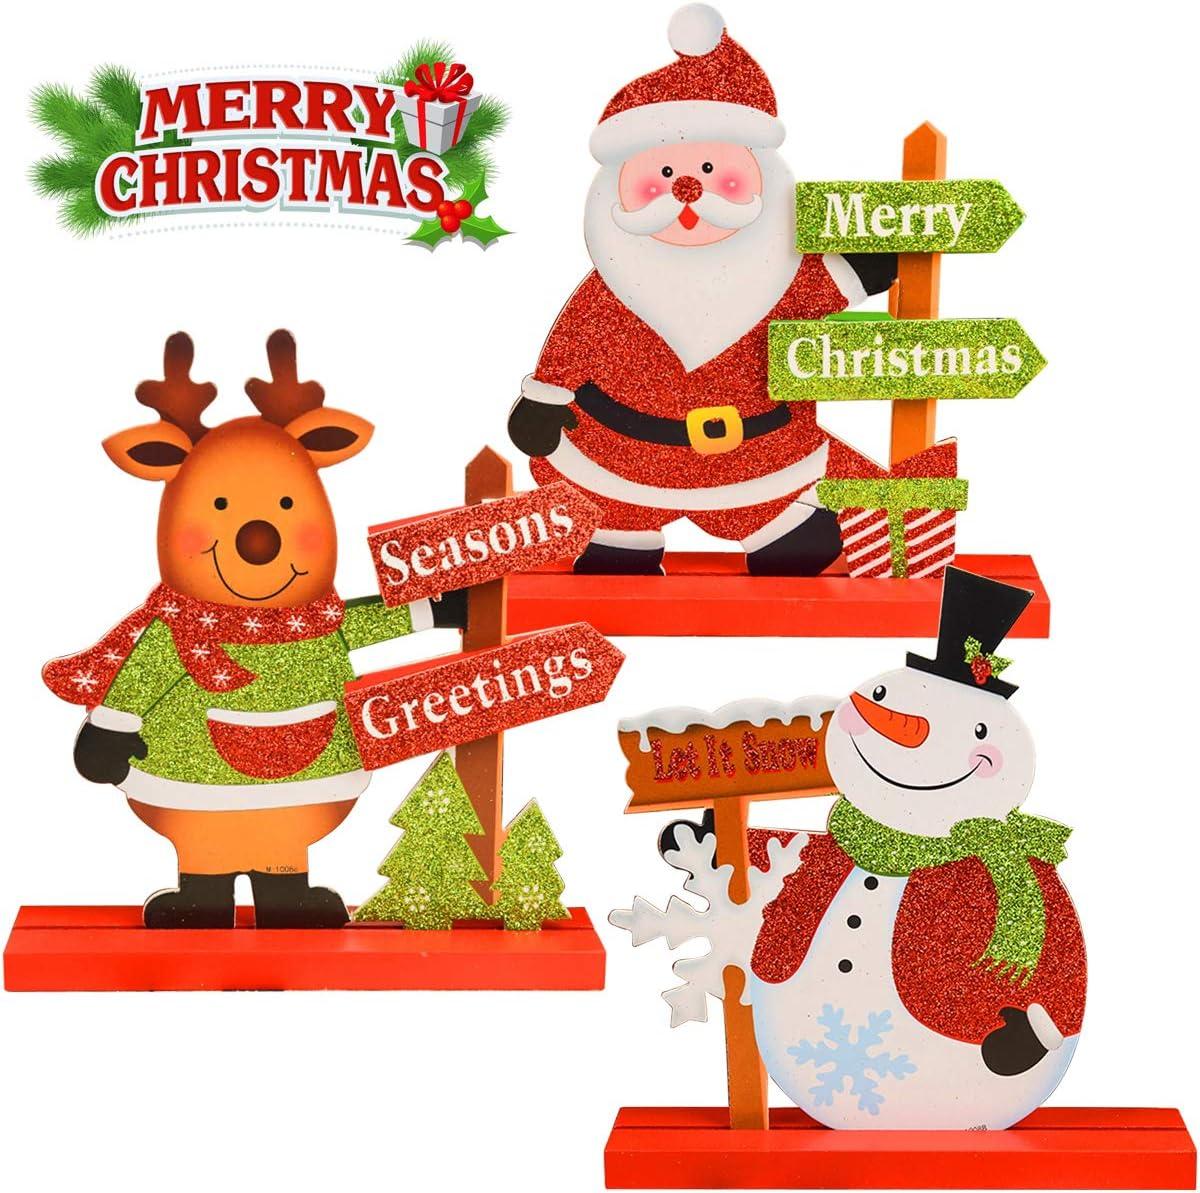 18 Green Christmas Wreath Santa Clause Reindeer Snowmen Snow Blue Red Lights Holidays Cheer Presents Chimney Snowflakes Front Door Swag